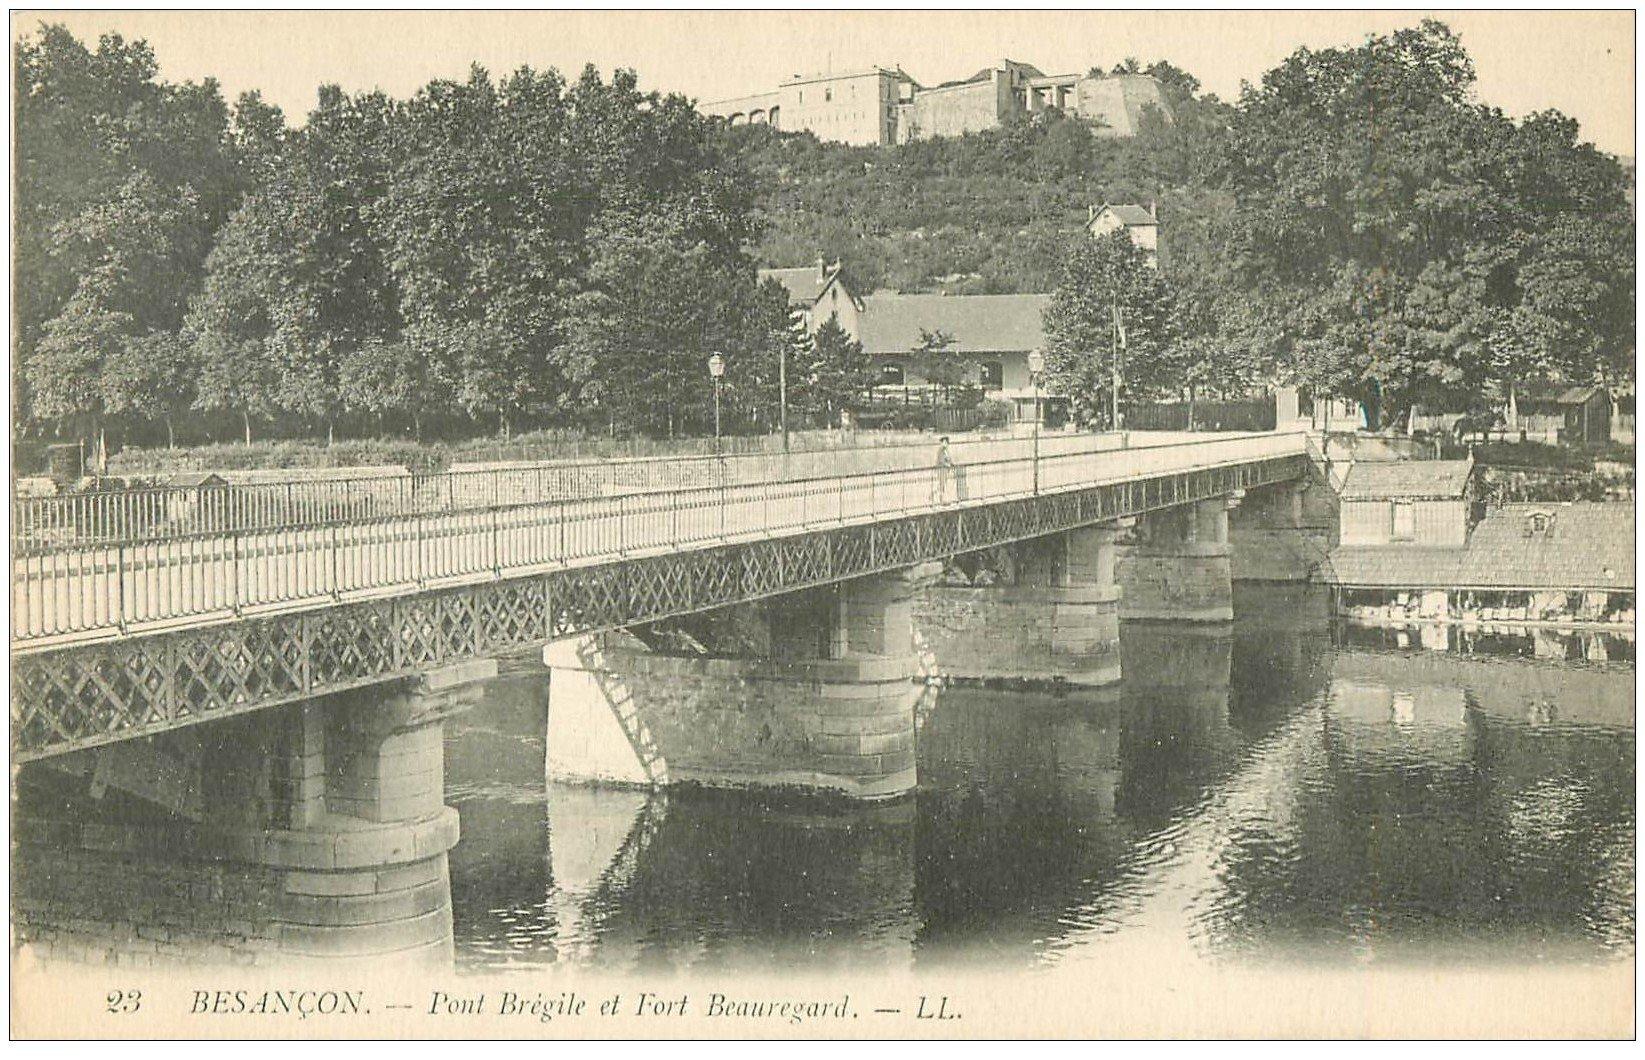 25 besancon pont br gile et fort beauregard for 25 besancon